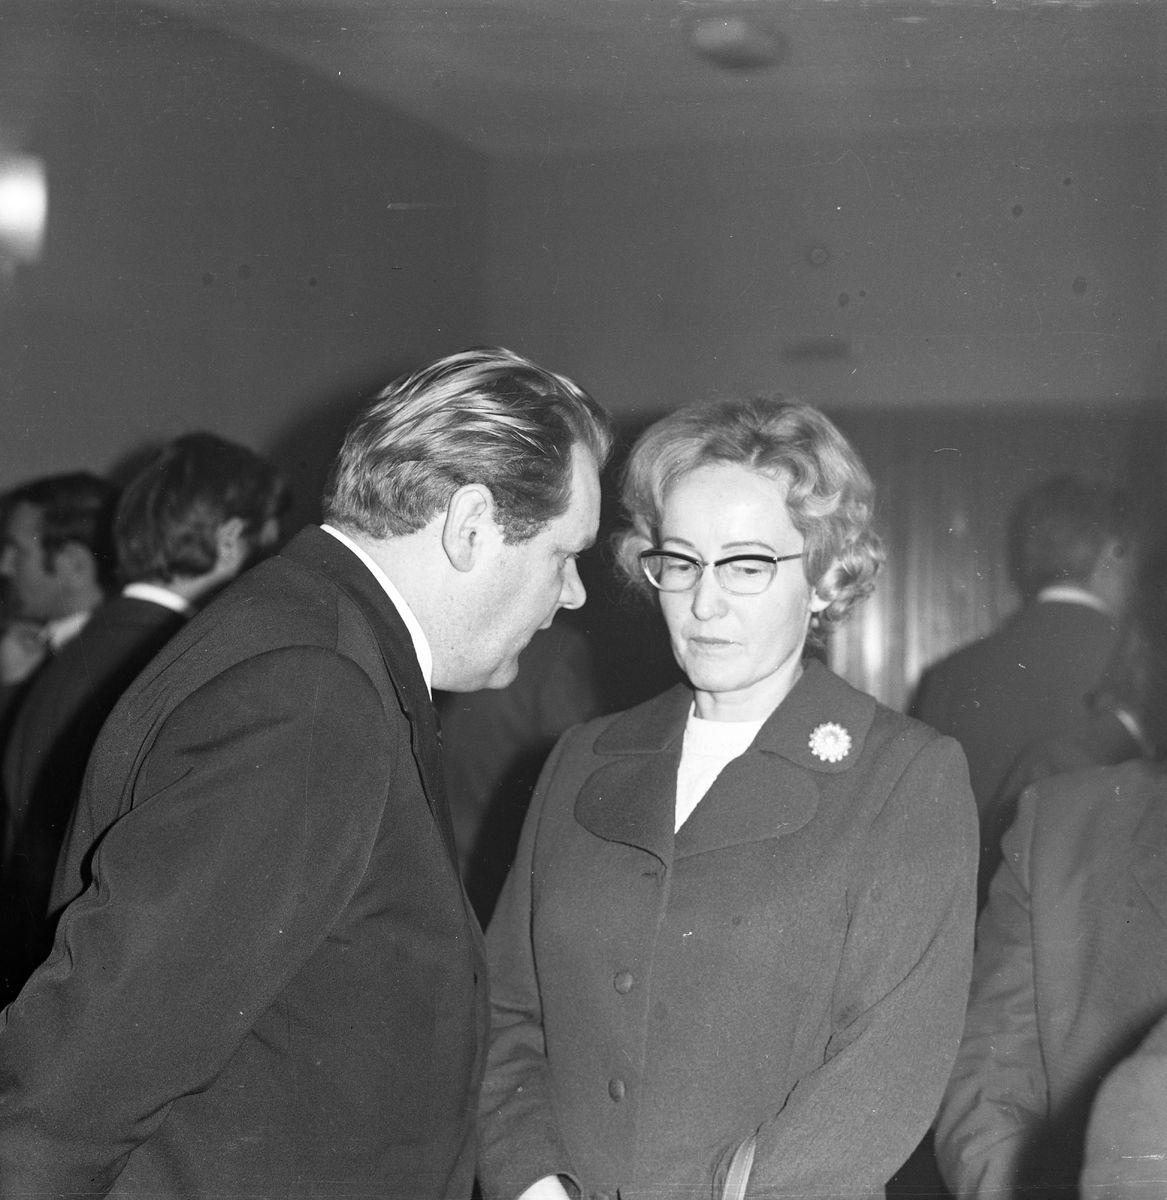 Spotkanie partyjne, 1974 r. [3]